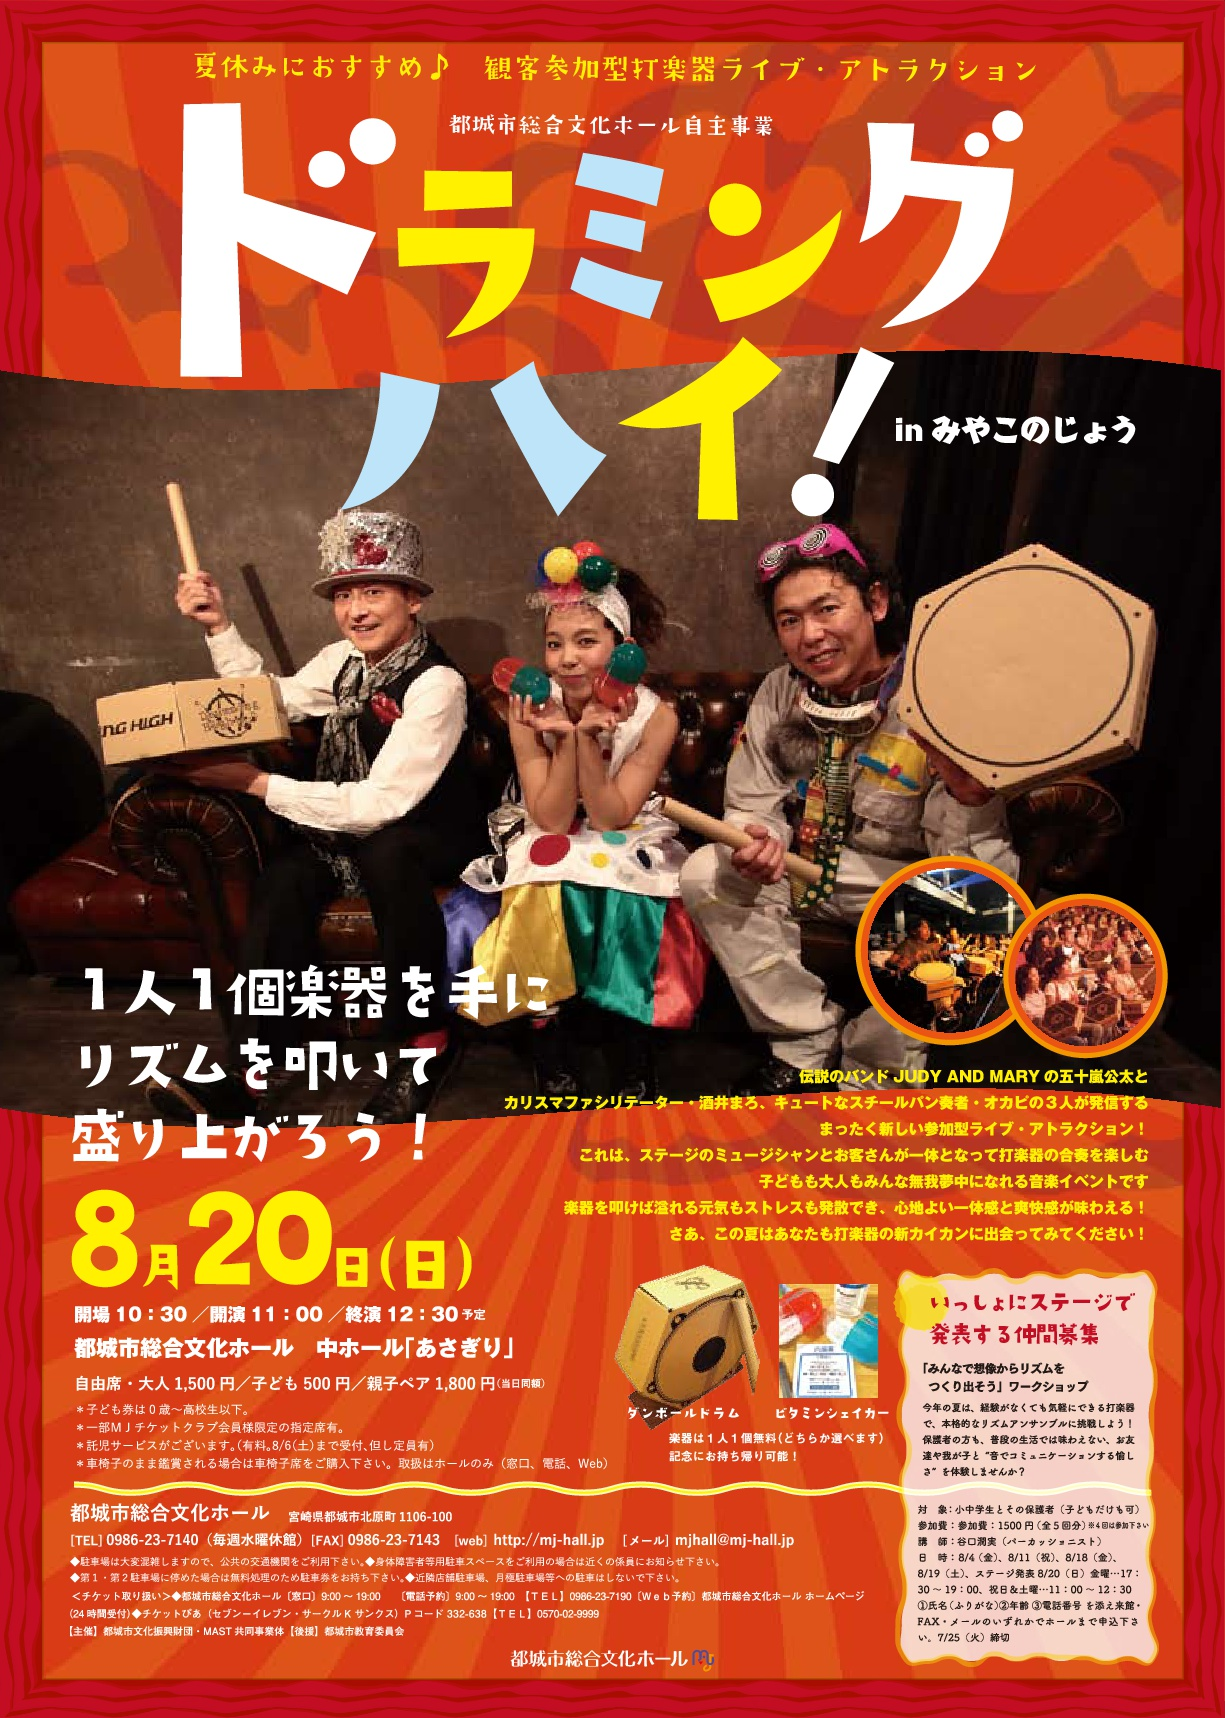 http://mj-hall.jp/performance/290820omote.jpg